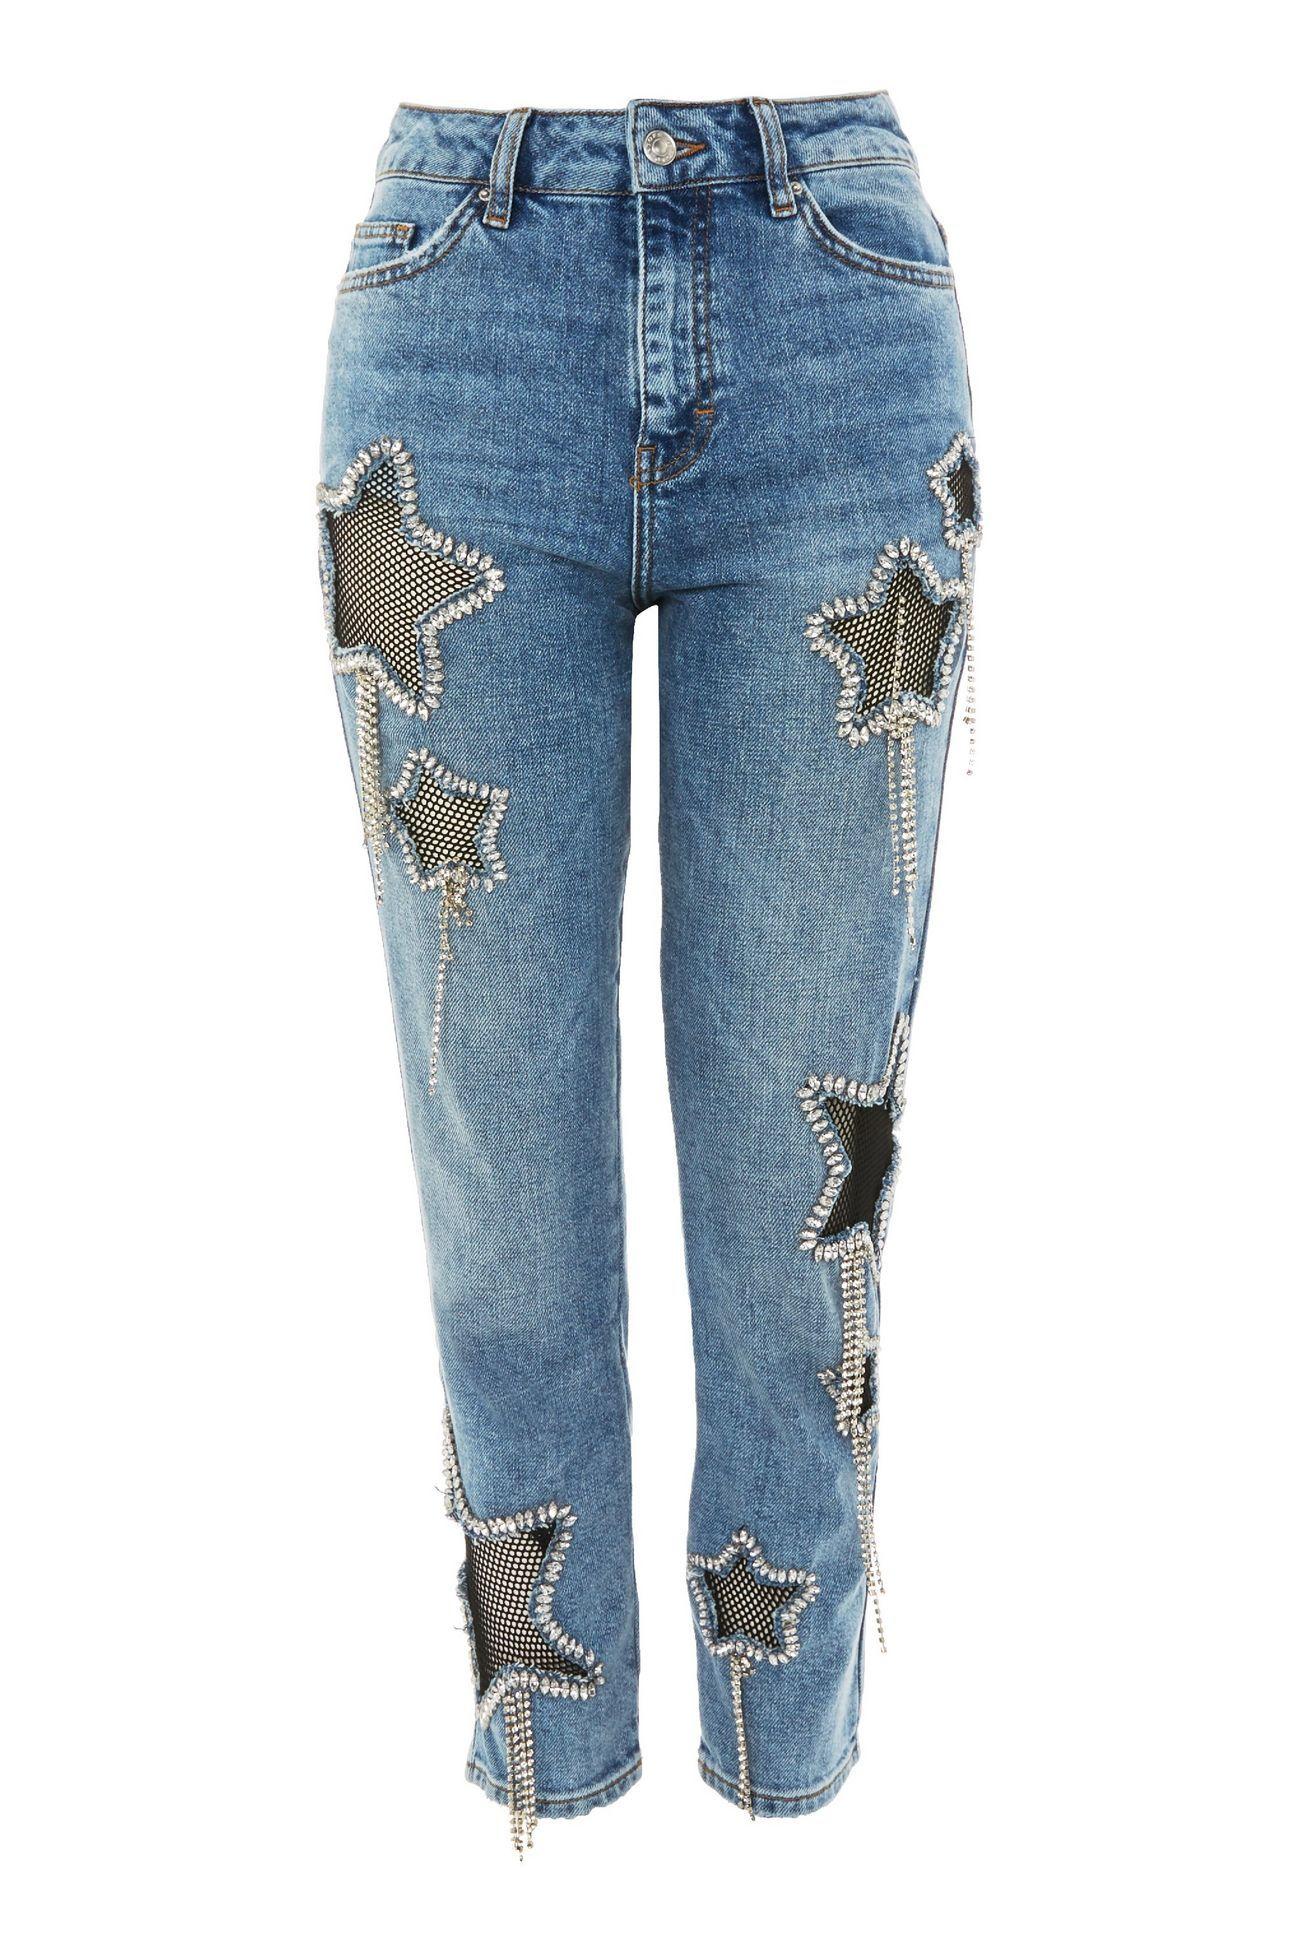 Ladies Diamante Embellished Front Pocket Jeggings Girls  Jeans Stylish Pants